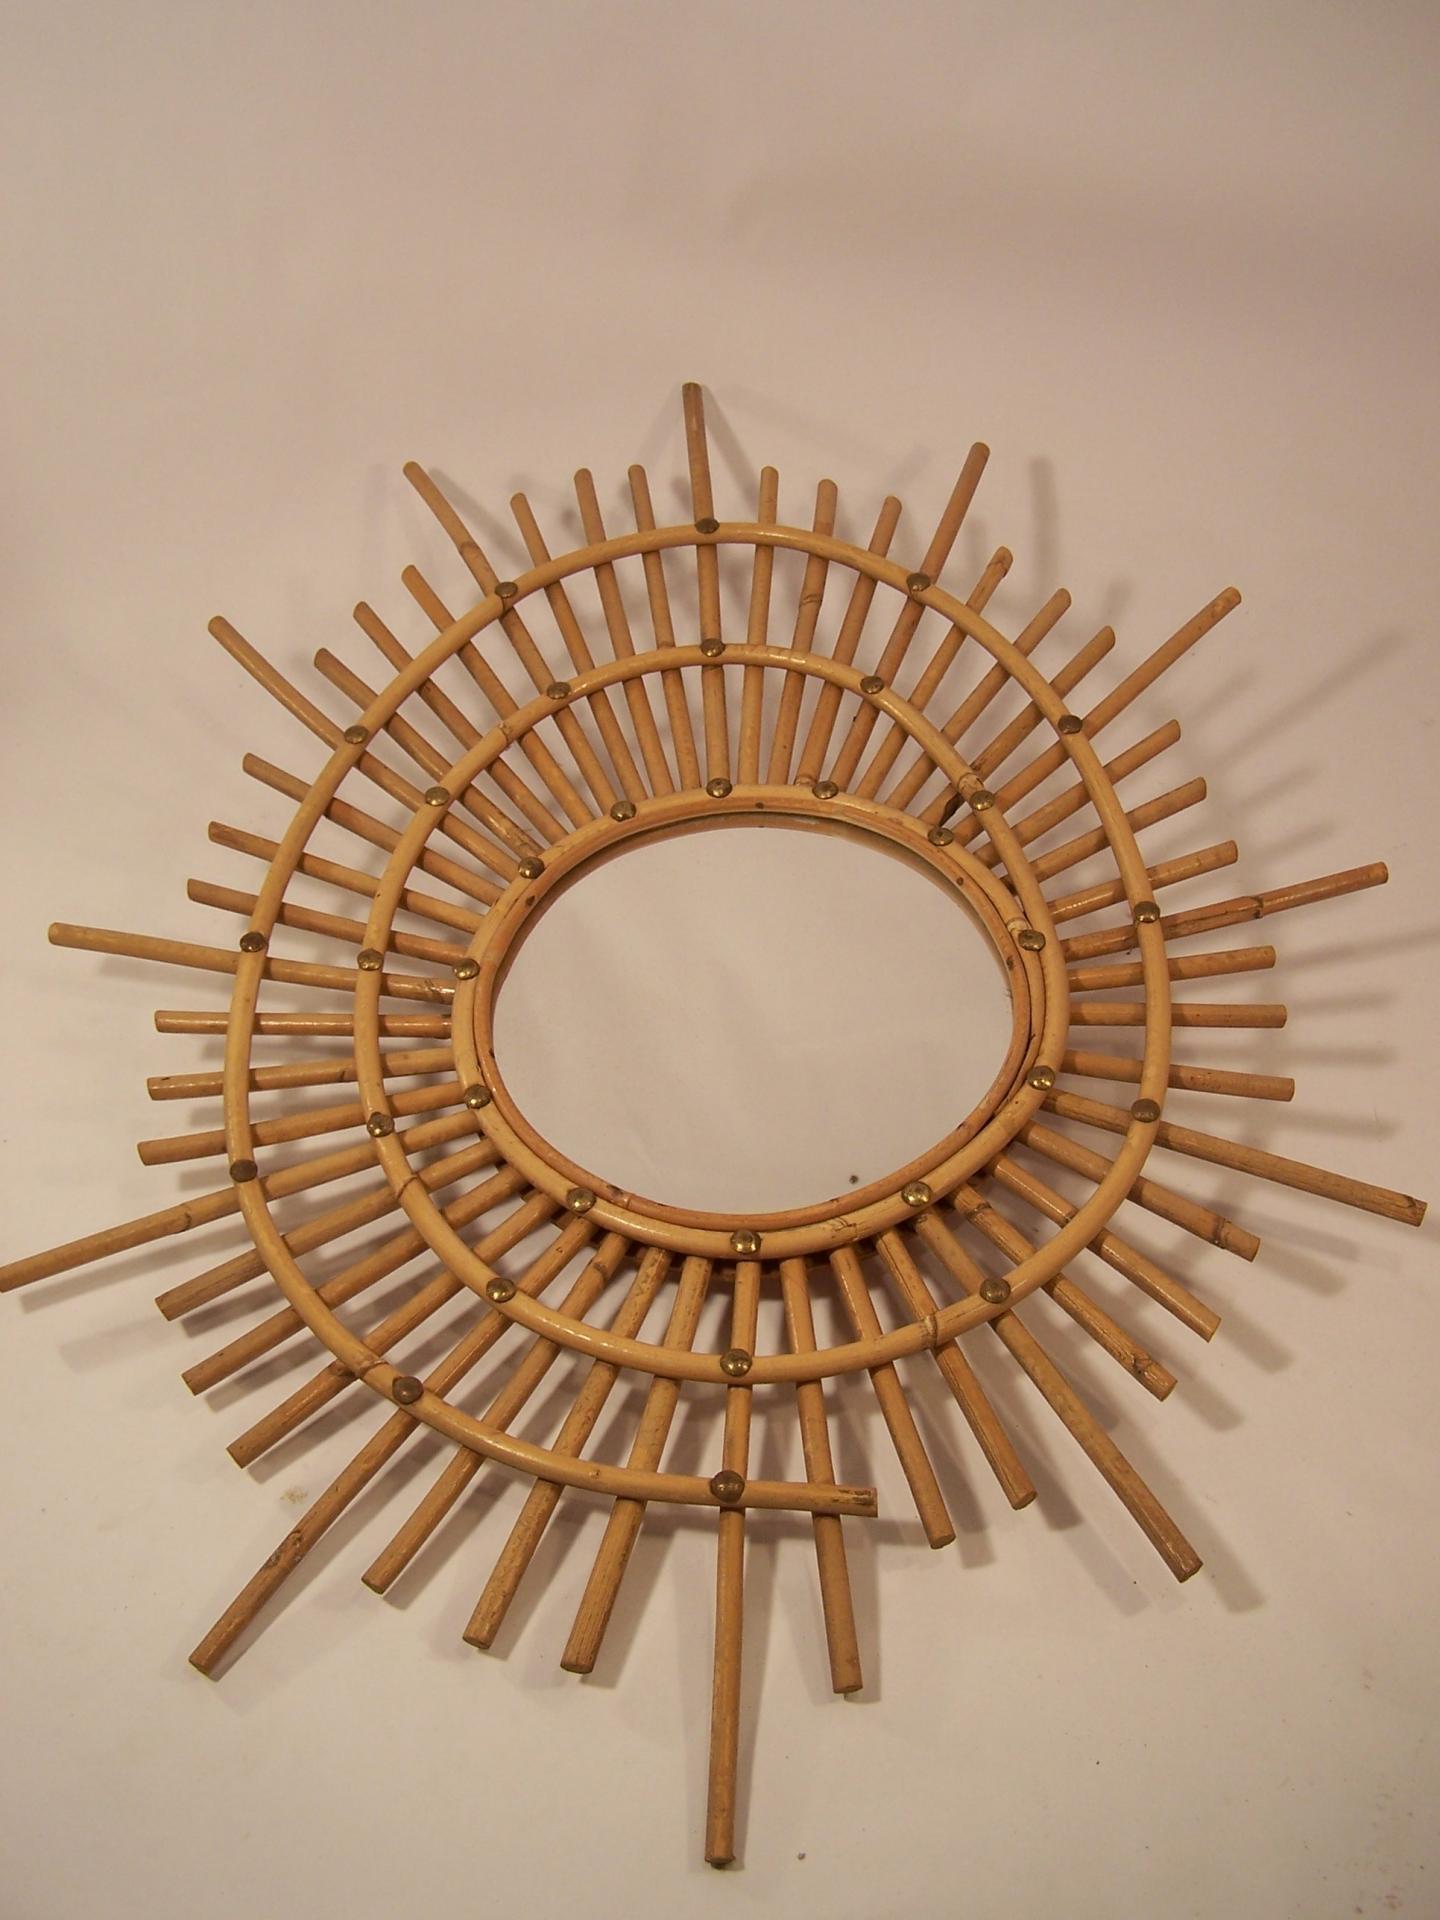 Miroir en osier forme libre des ann es 50 60 for Miroir diametre 50